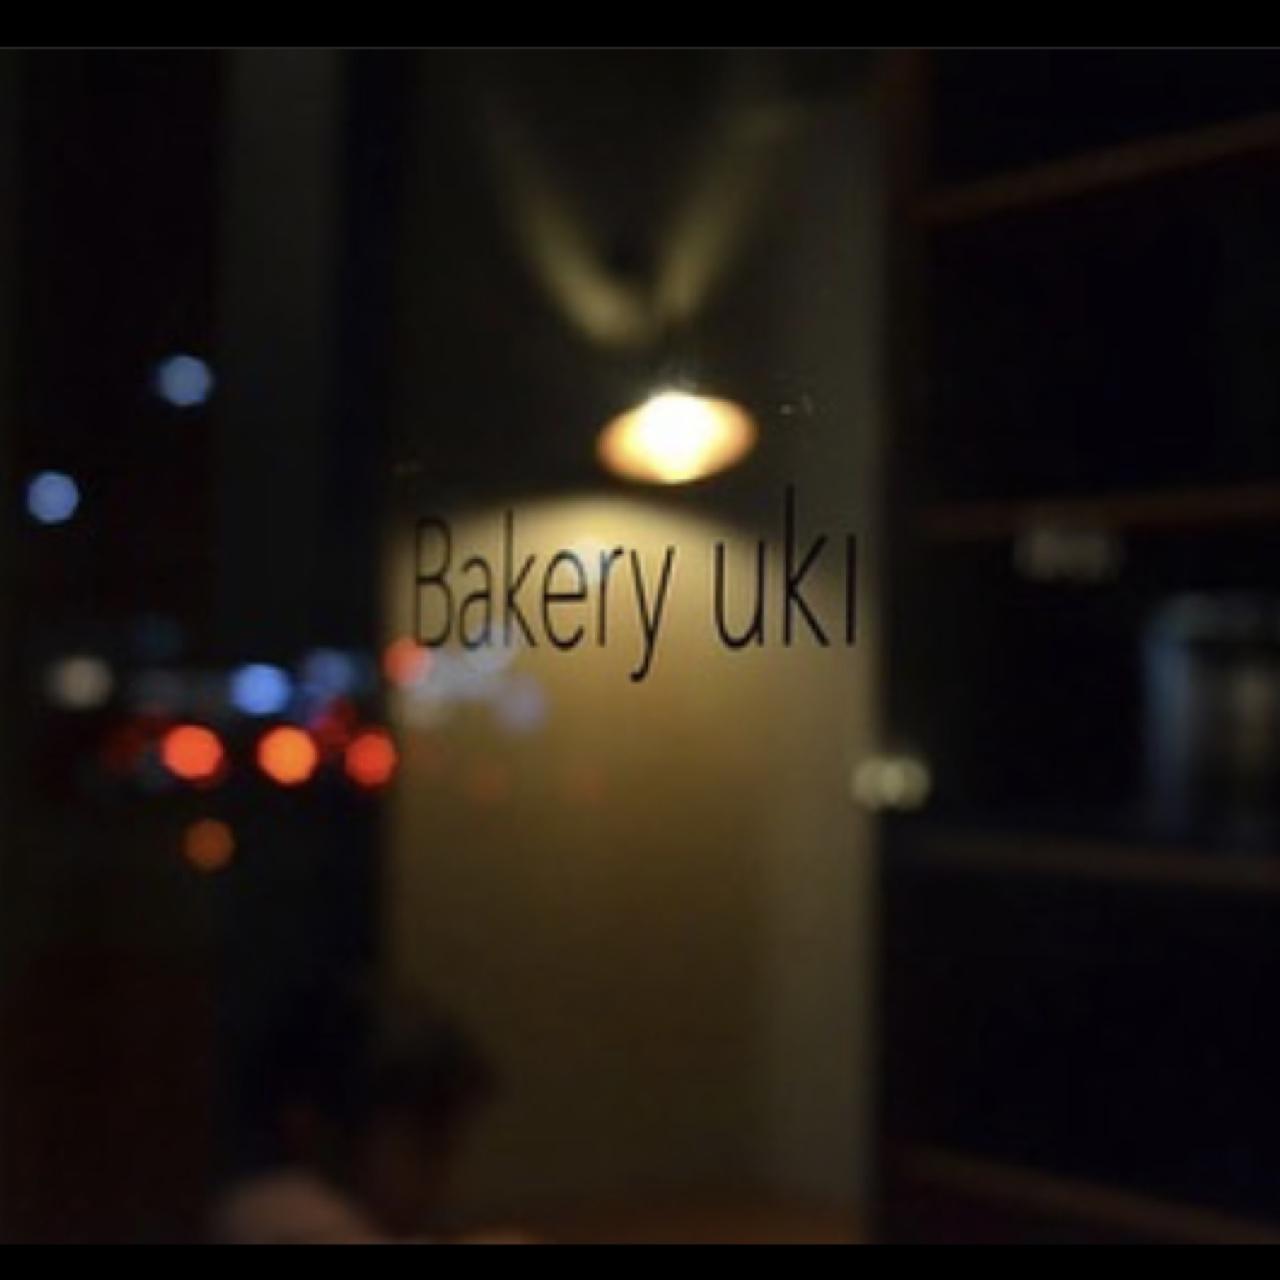 Bakery uki(ベーカリーウキ)>